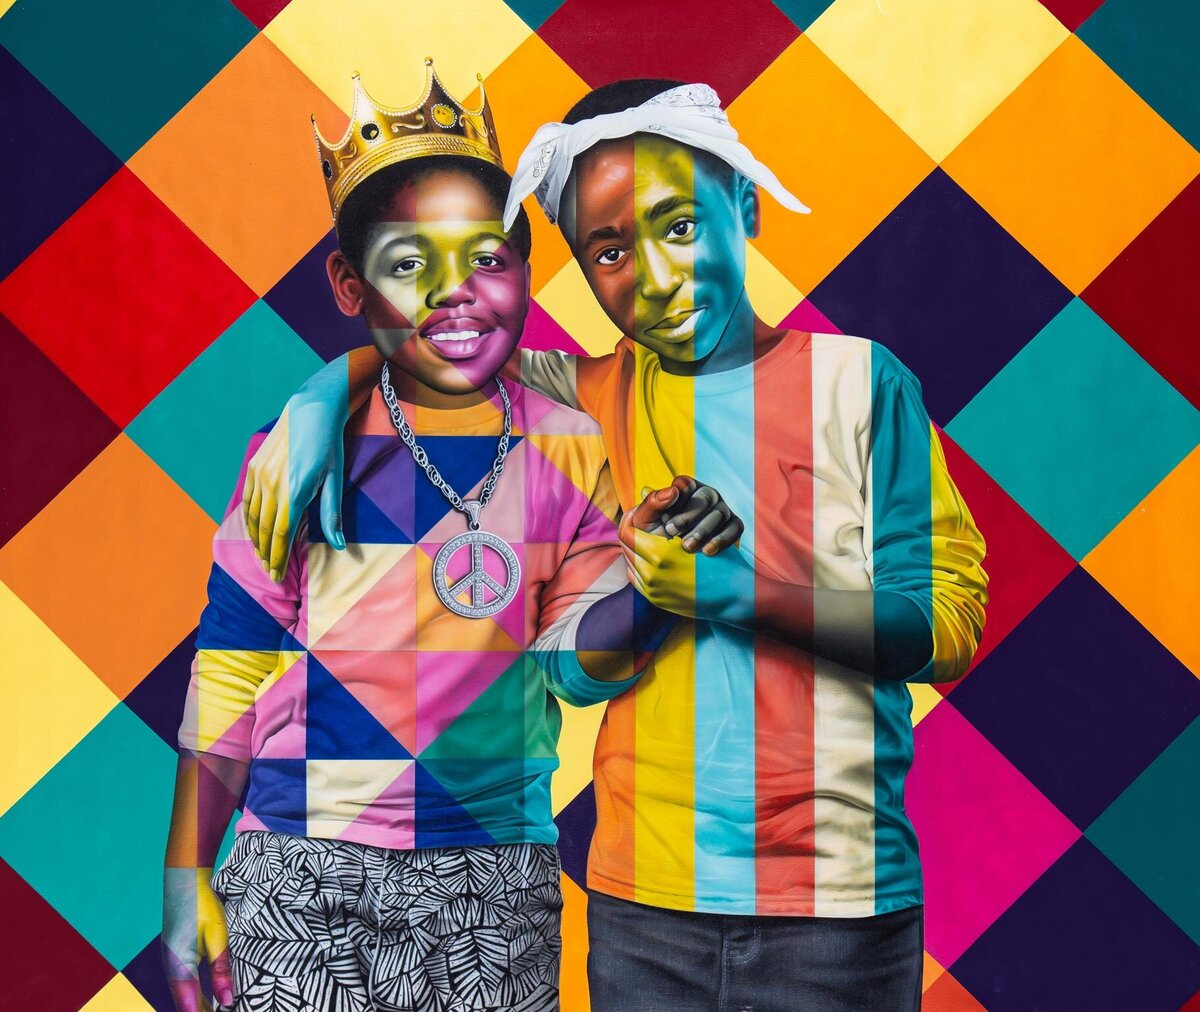 Tupac & Notorious B.I.G., 2019